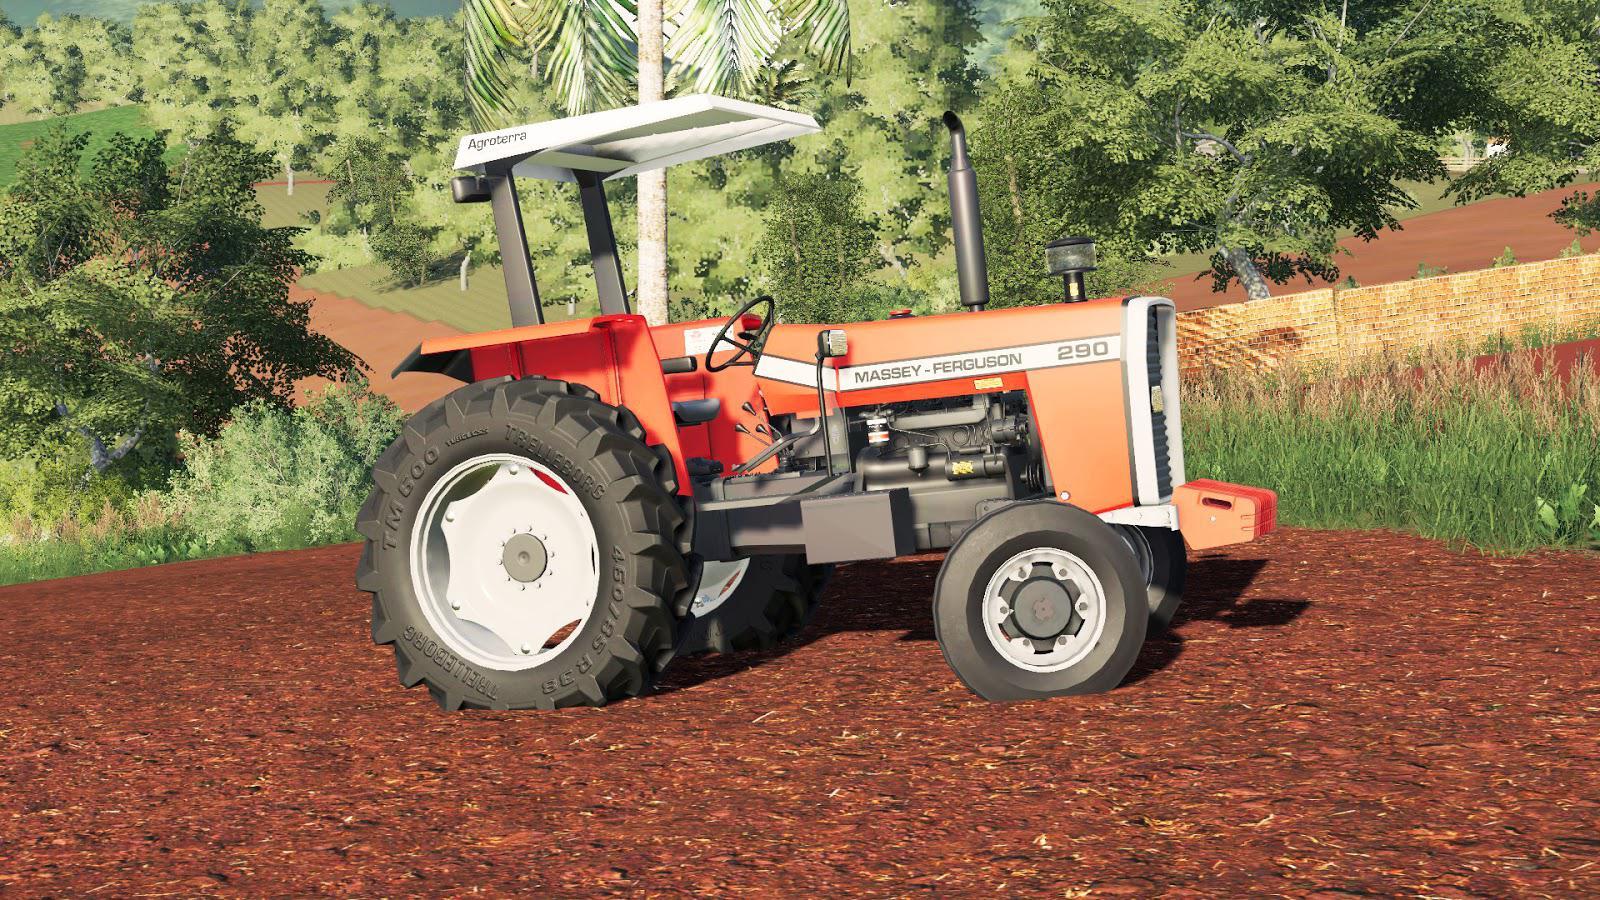 FS19 Massey Fergusson 290 v1 0 0 0 - Farming Simulator 17 mod / FS